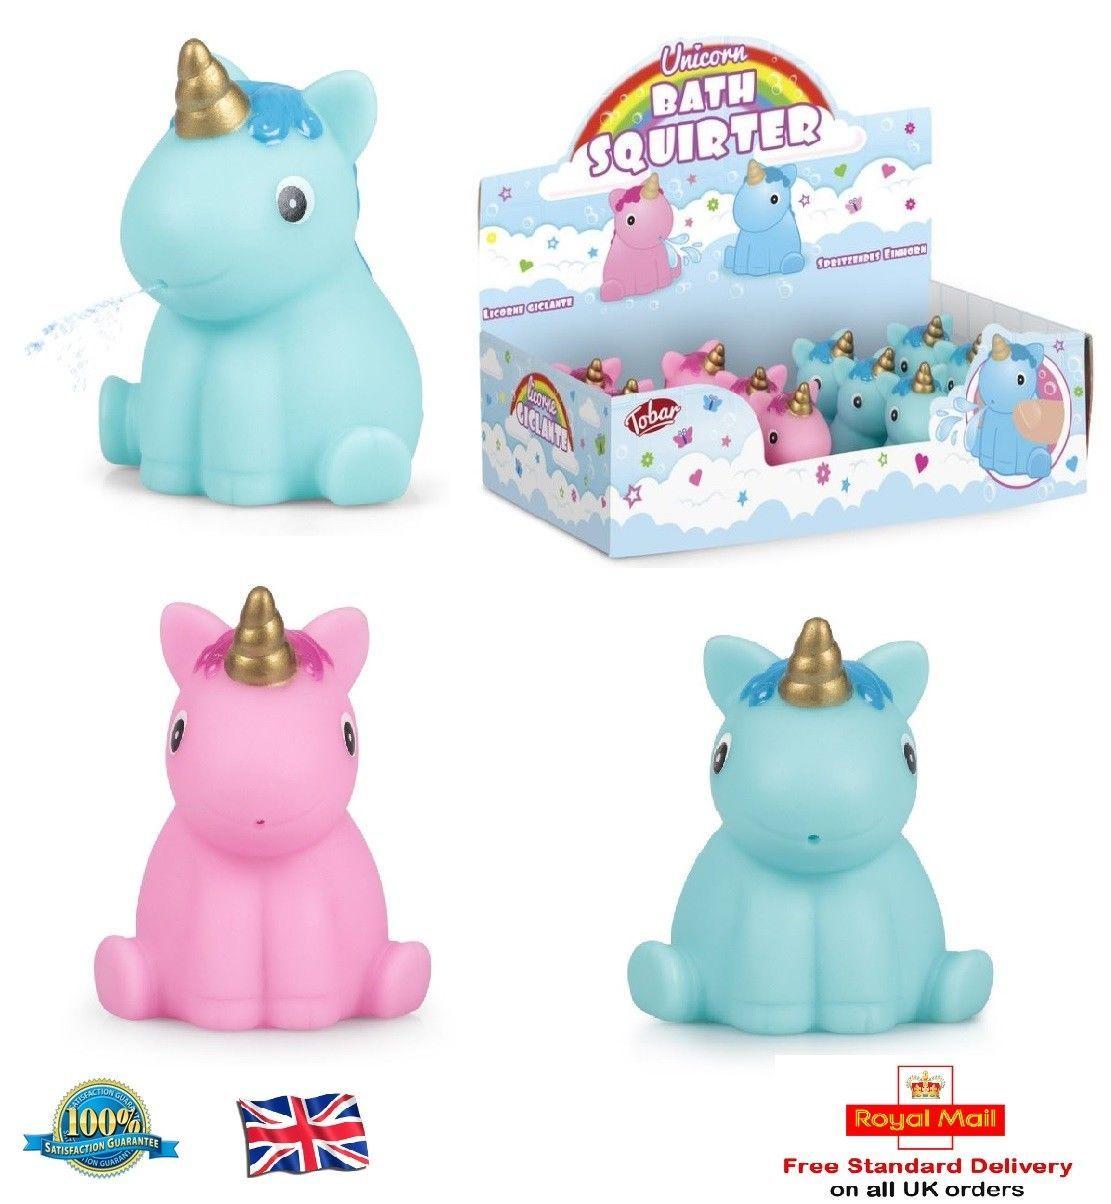 Stocking Filler Gift Fun Kids Light Up Unicorn Bath Time Toy